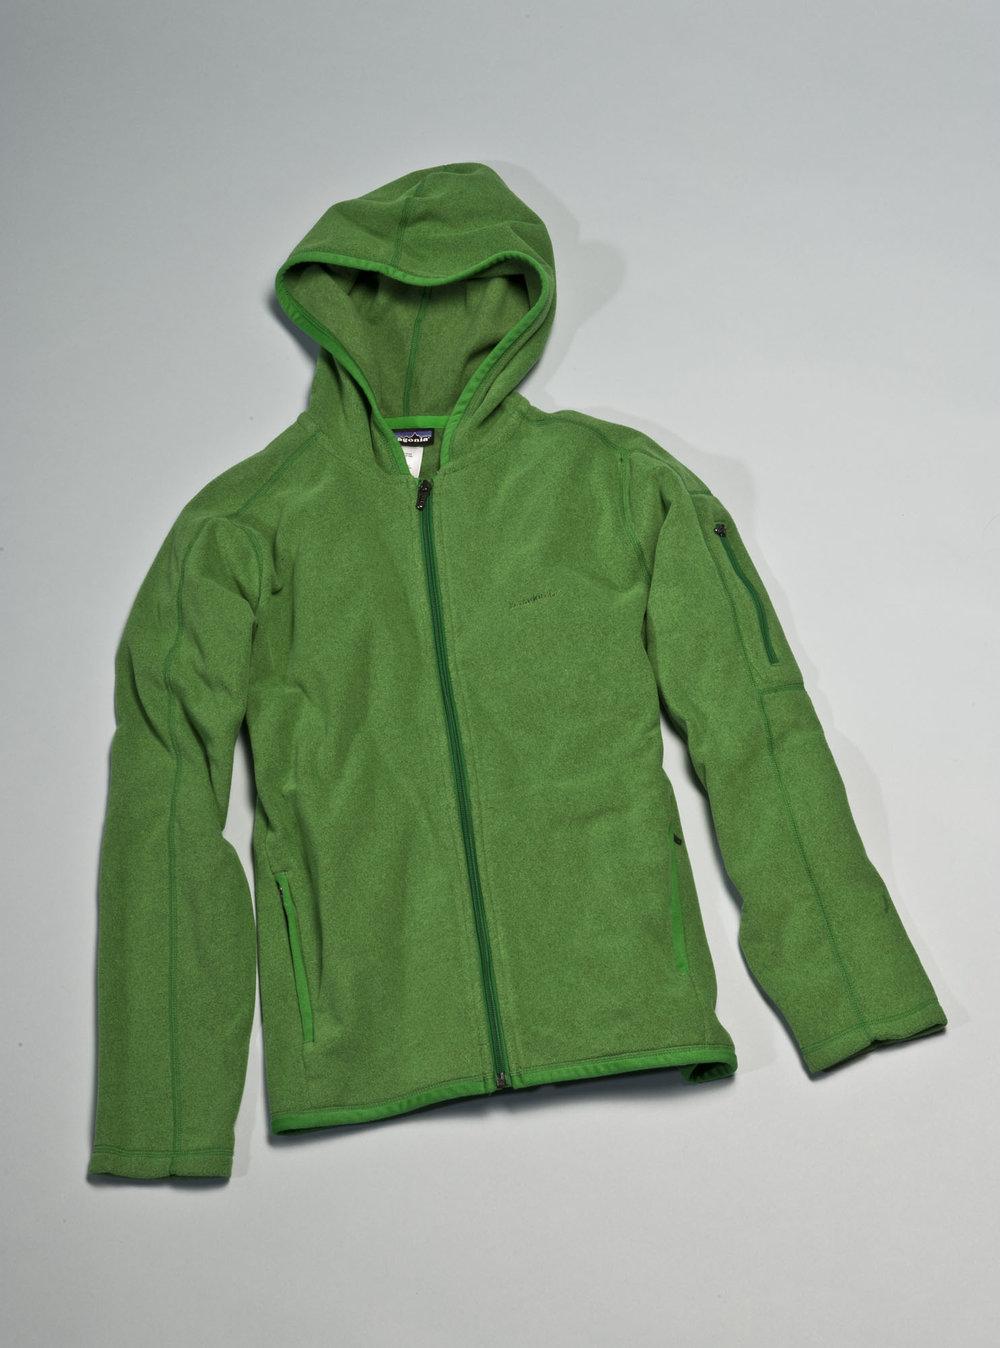 Patagonia,Aravis 绒面连帽衫,2012 年 聚酯纤维